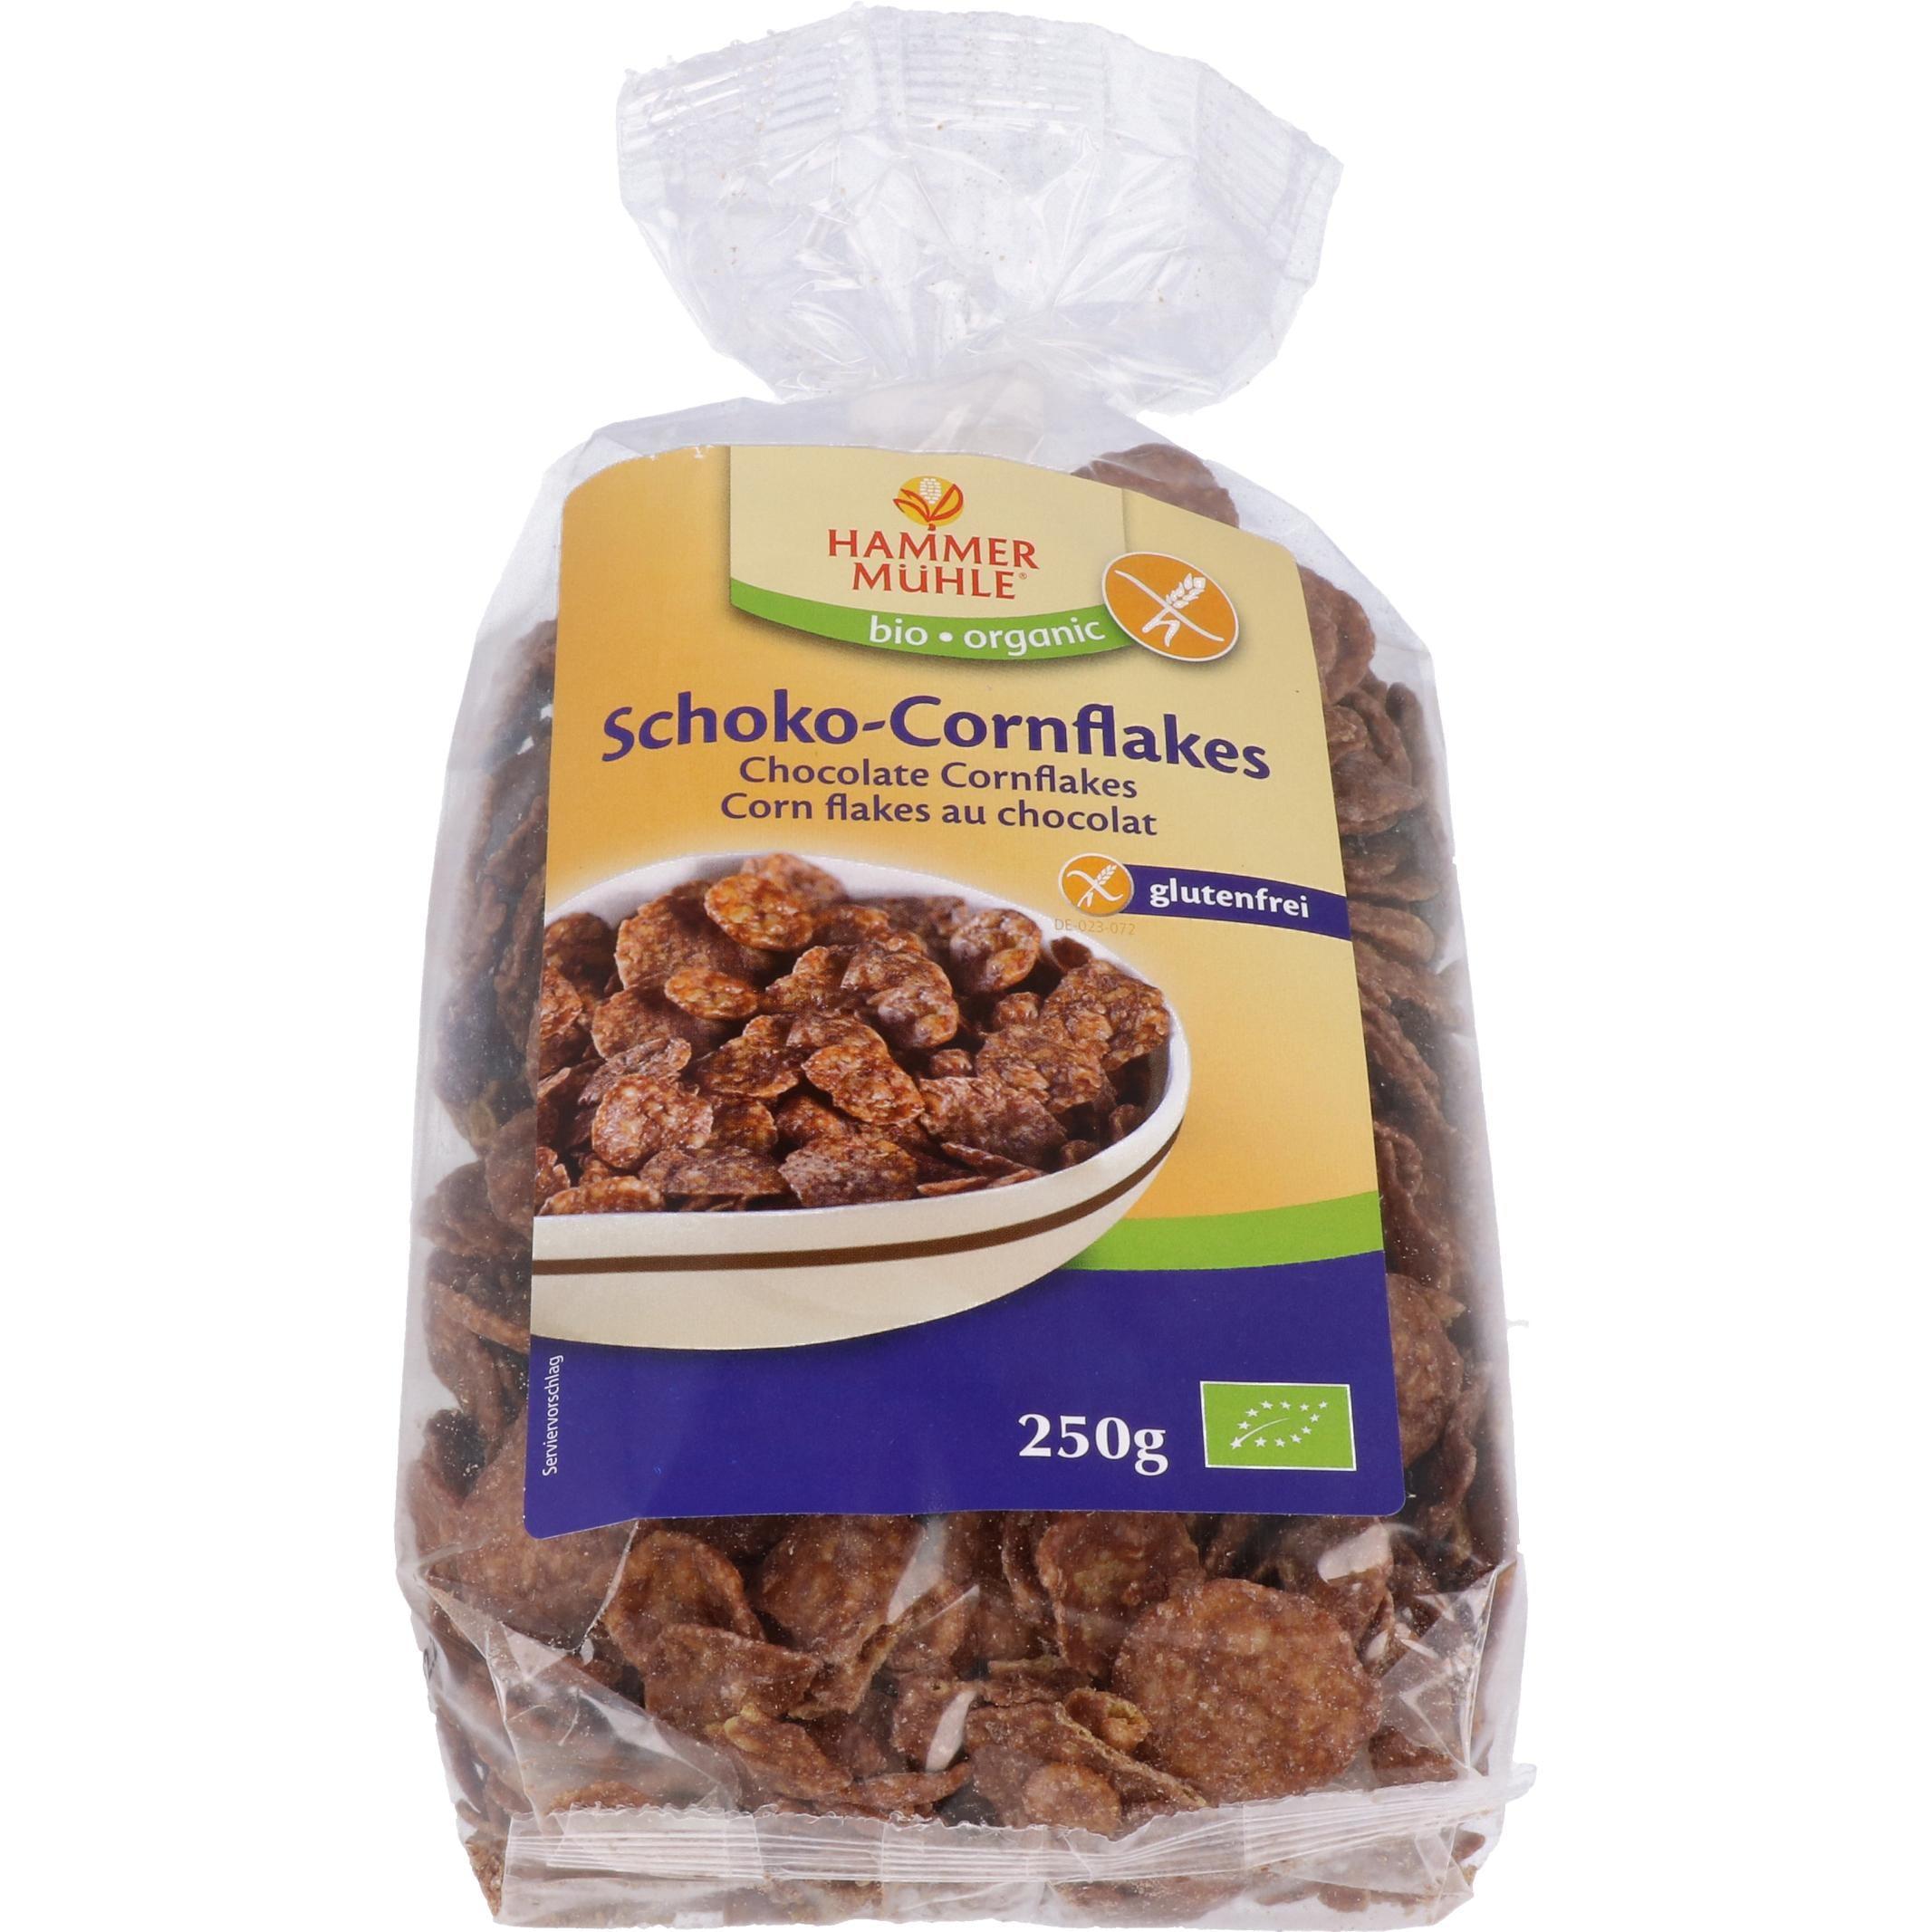 Hammermühle Organic Bio Schoko-Cornflakes 250g